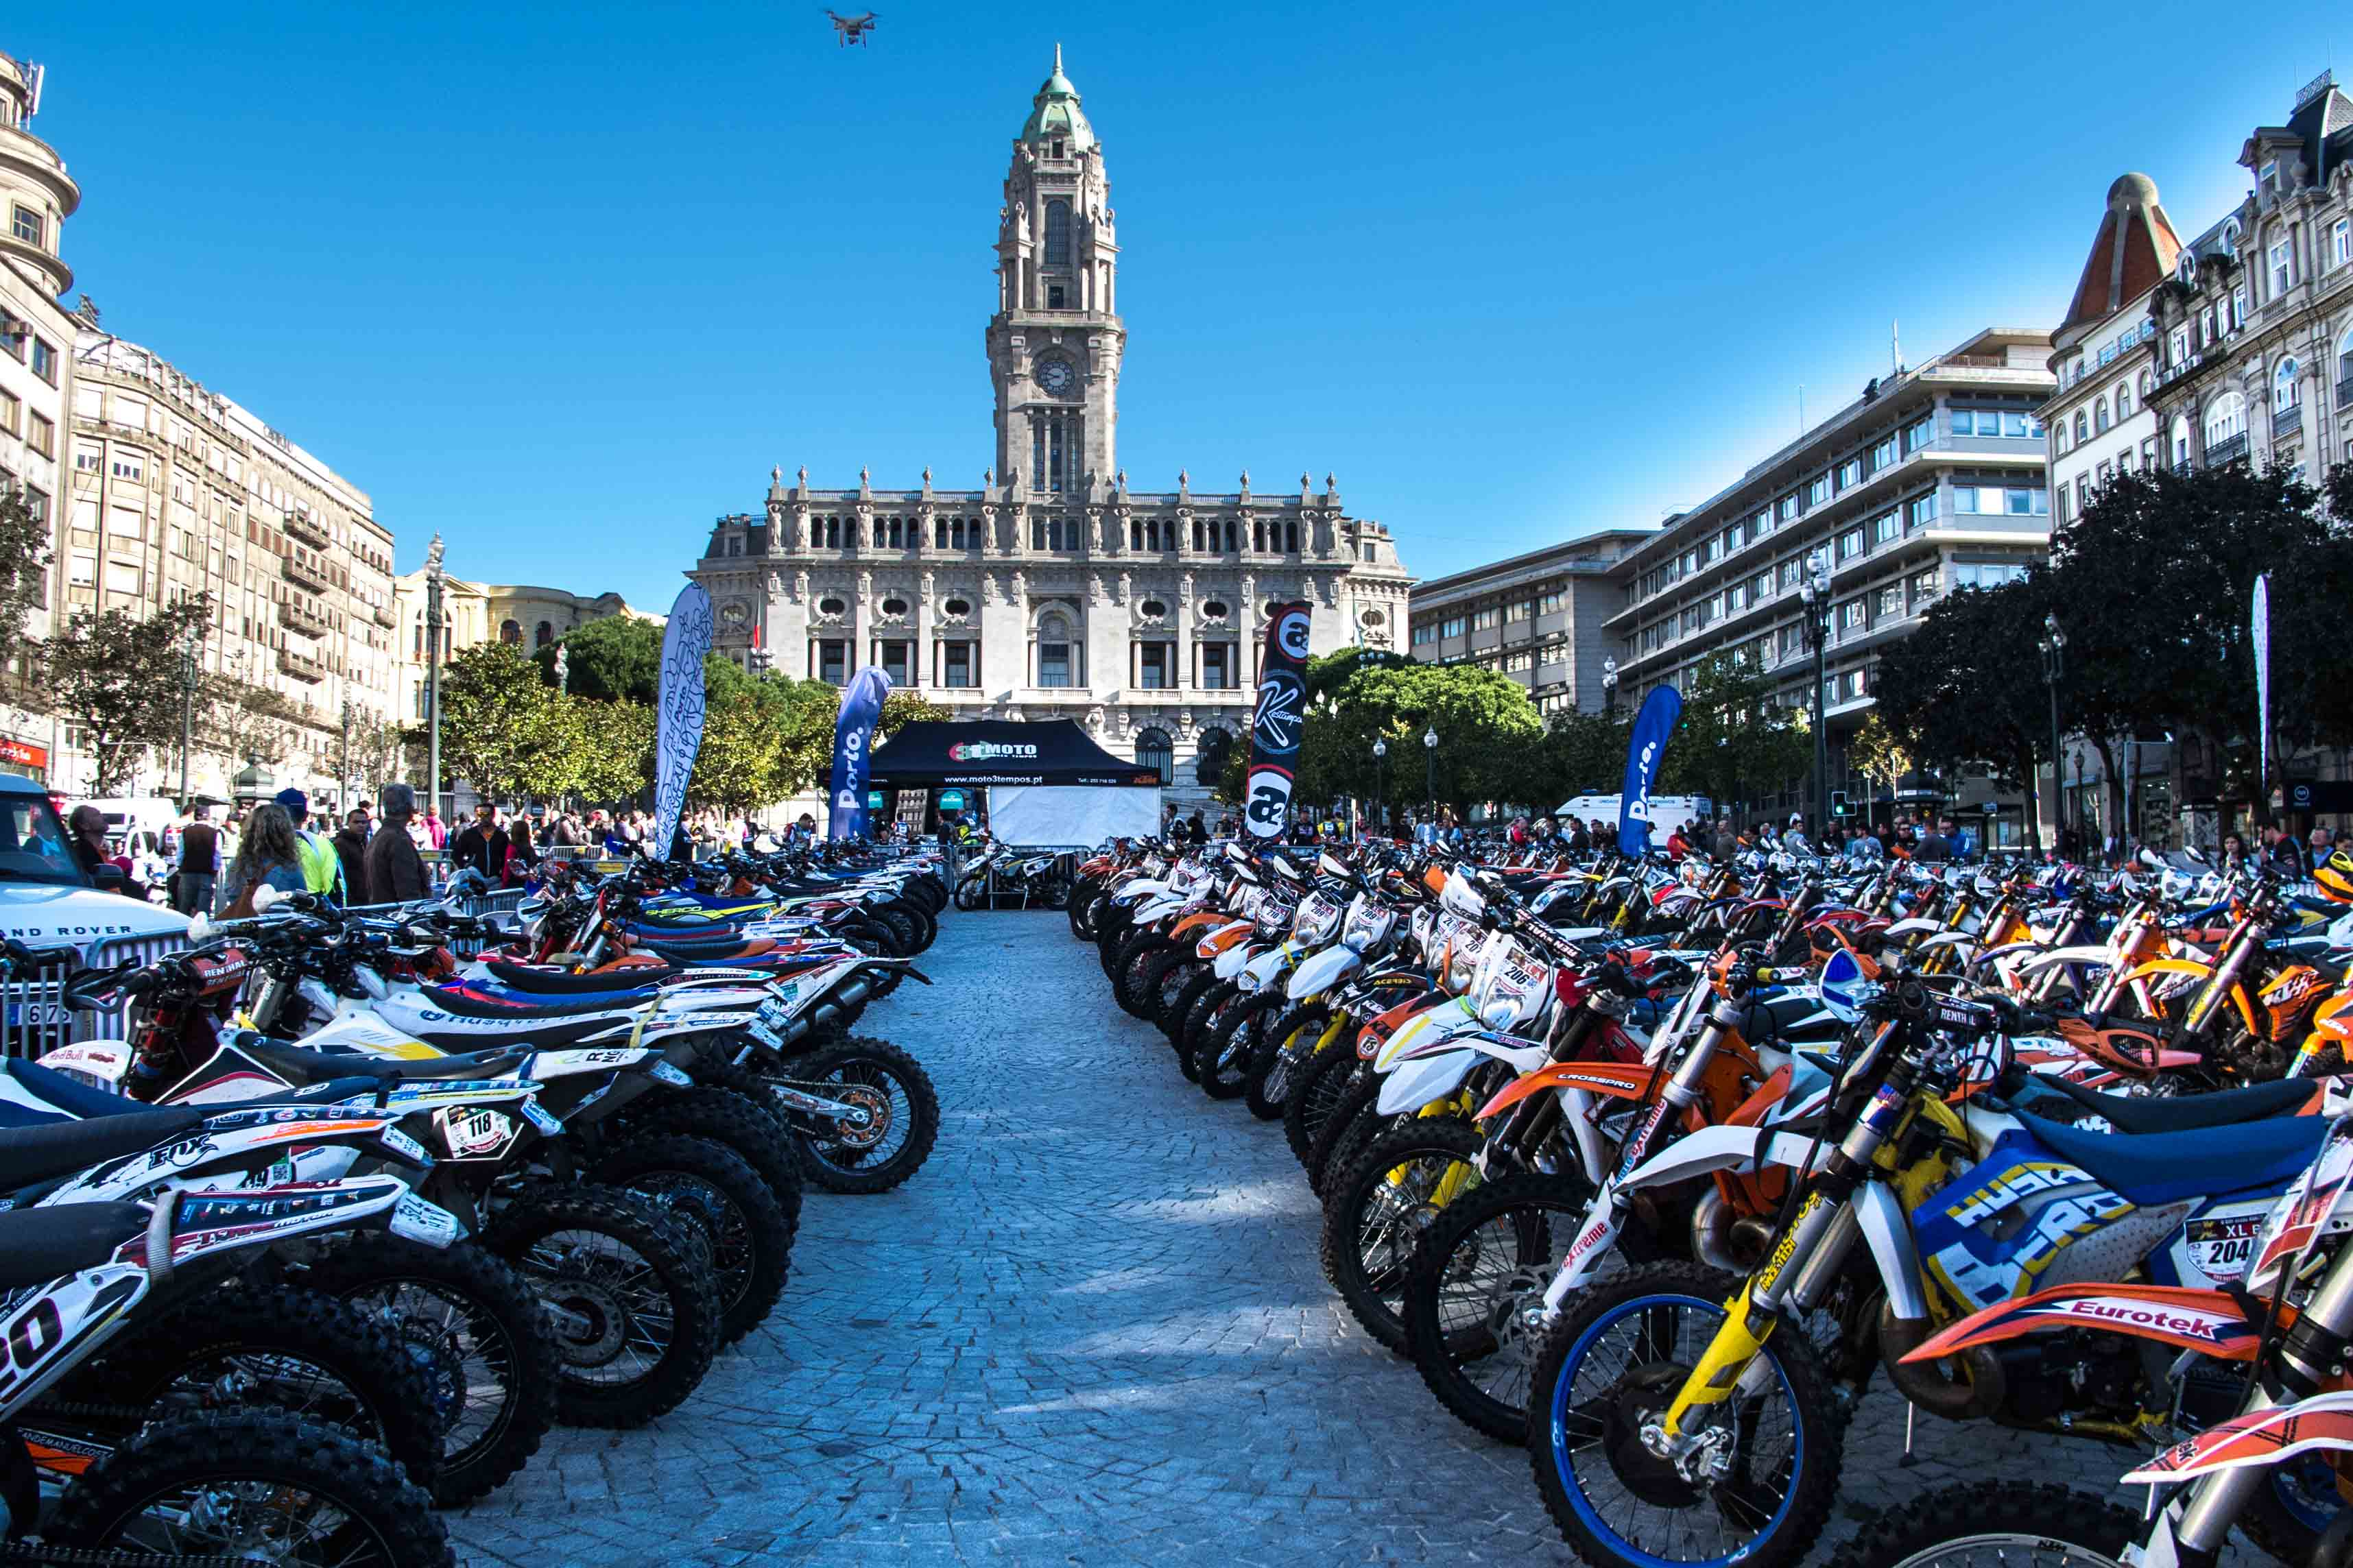 Enduro Bikes parked at Avenida dos Aliados